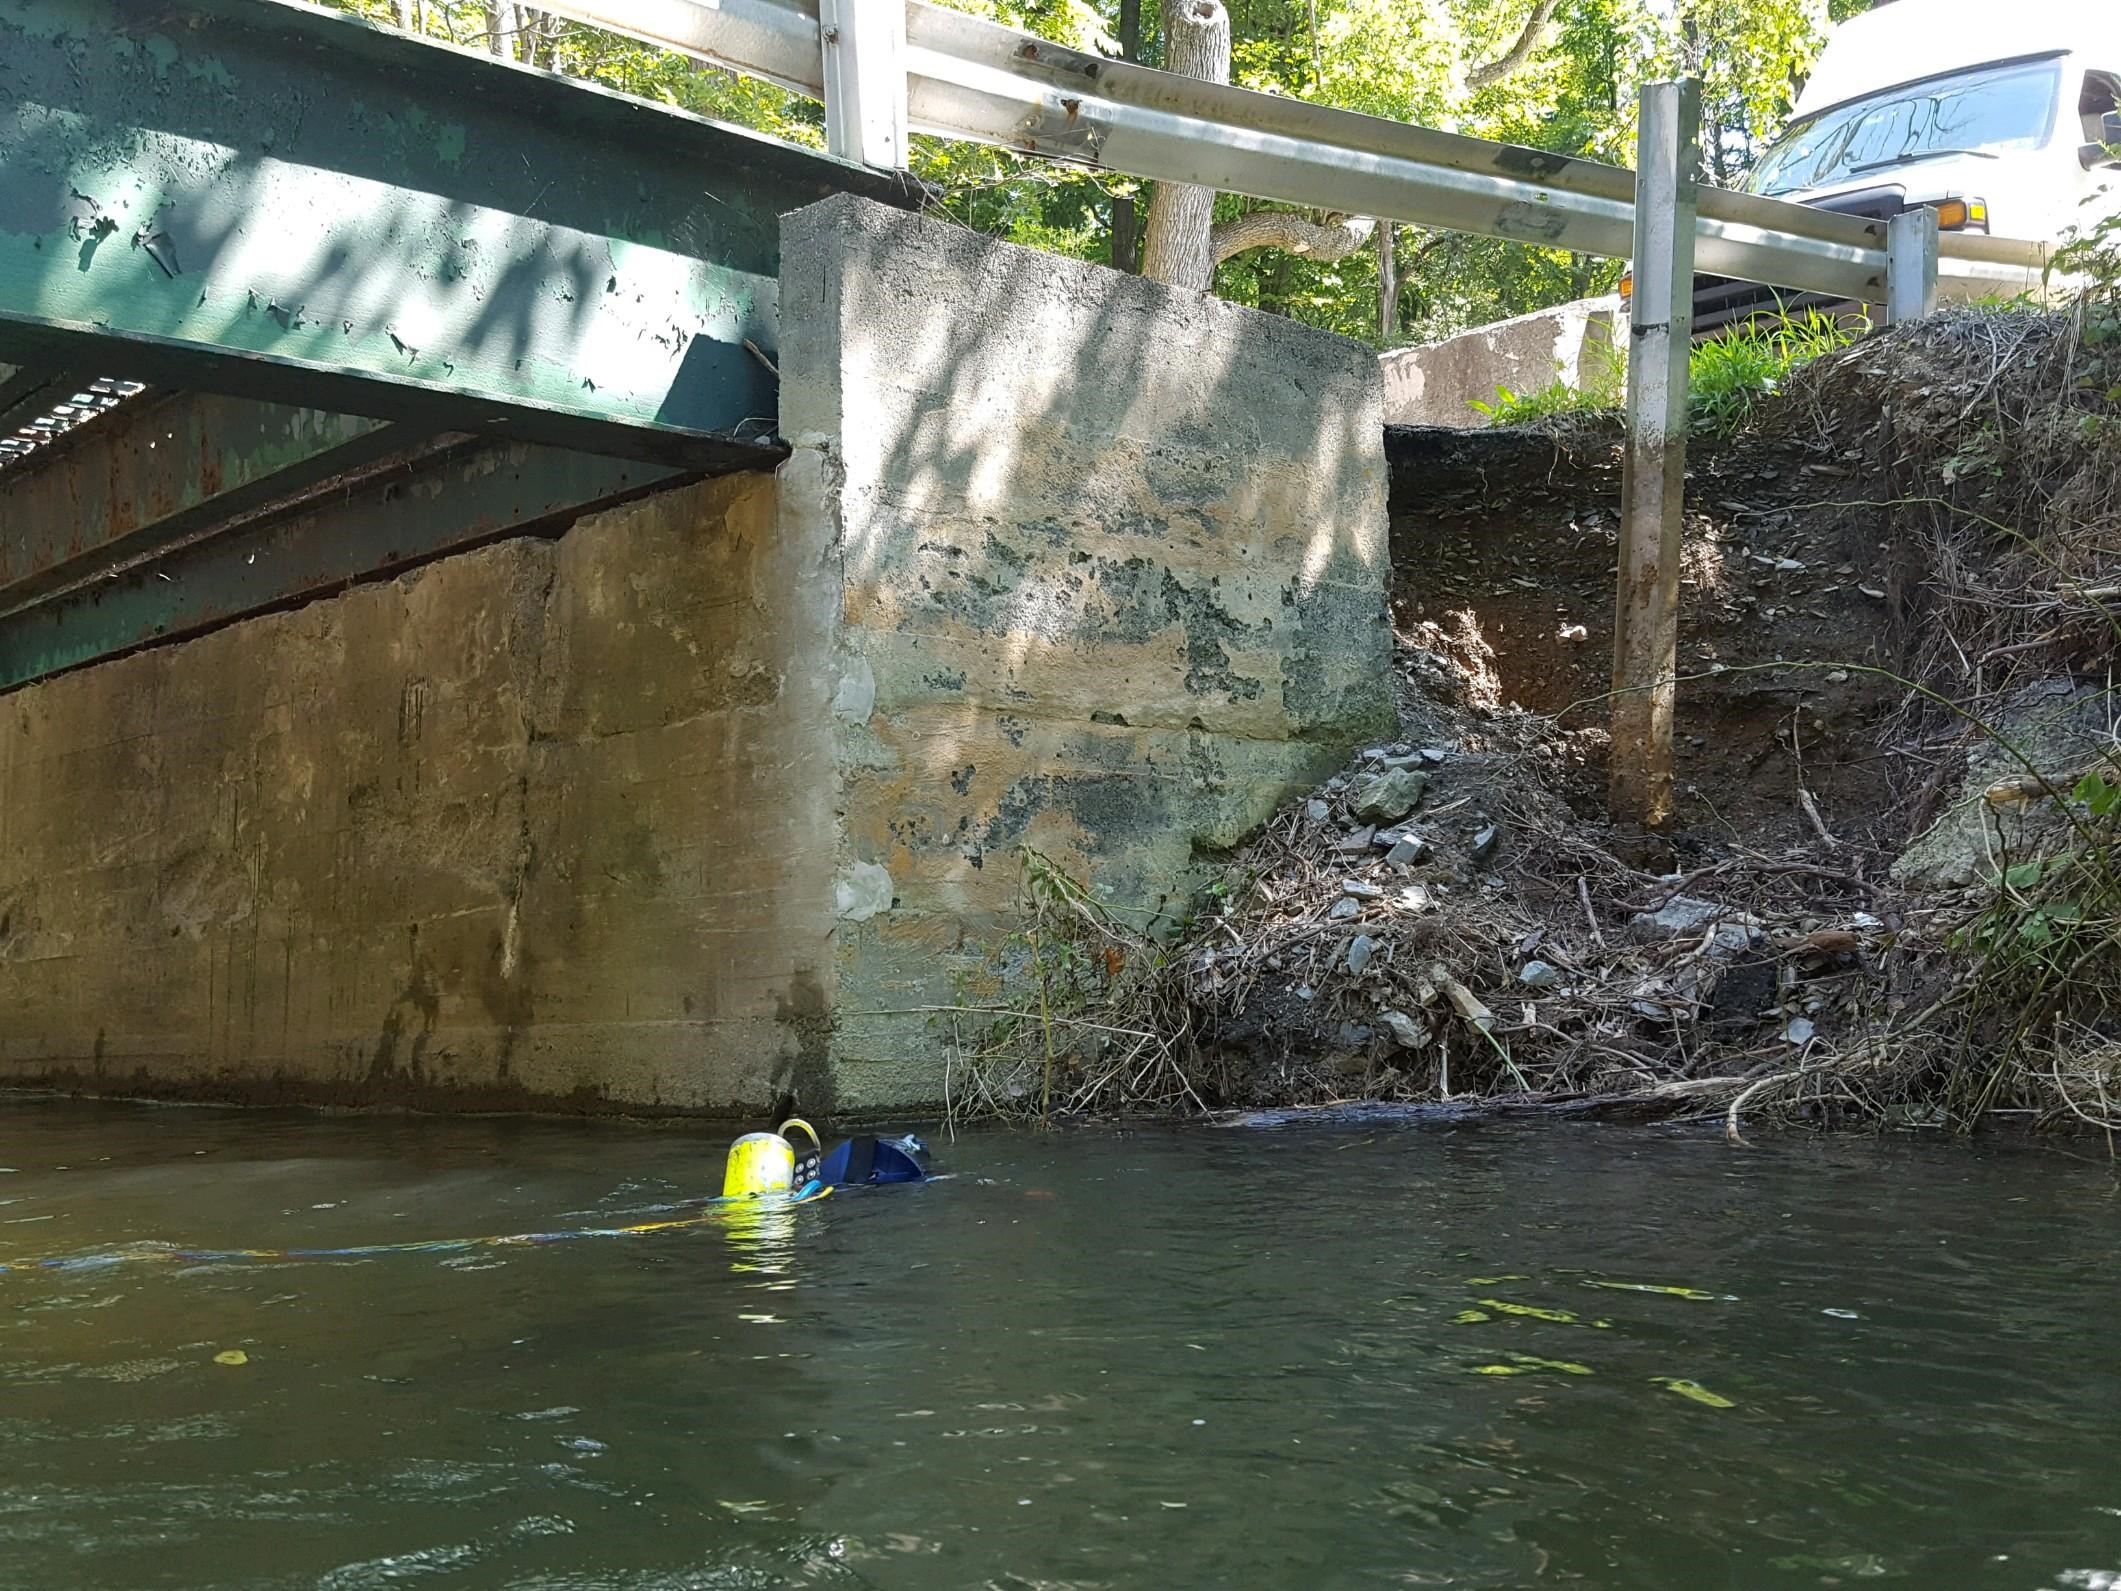 Flood Bridge Inspections